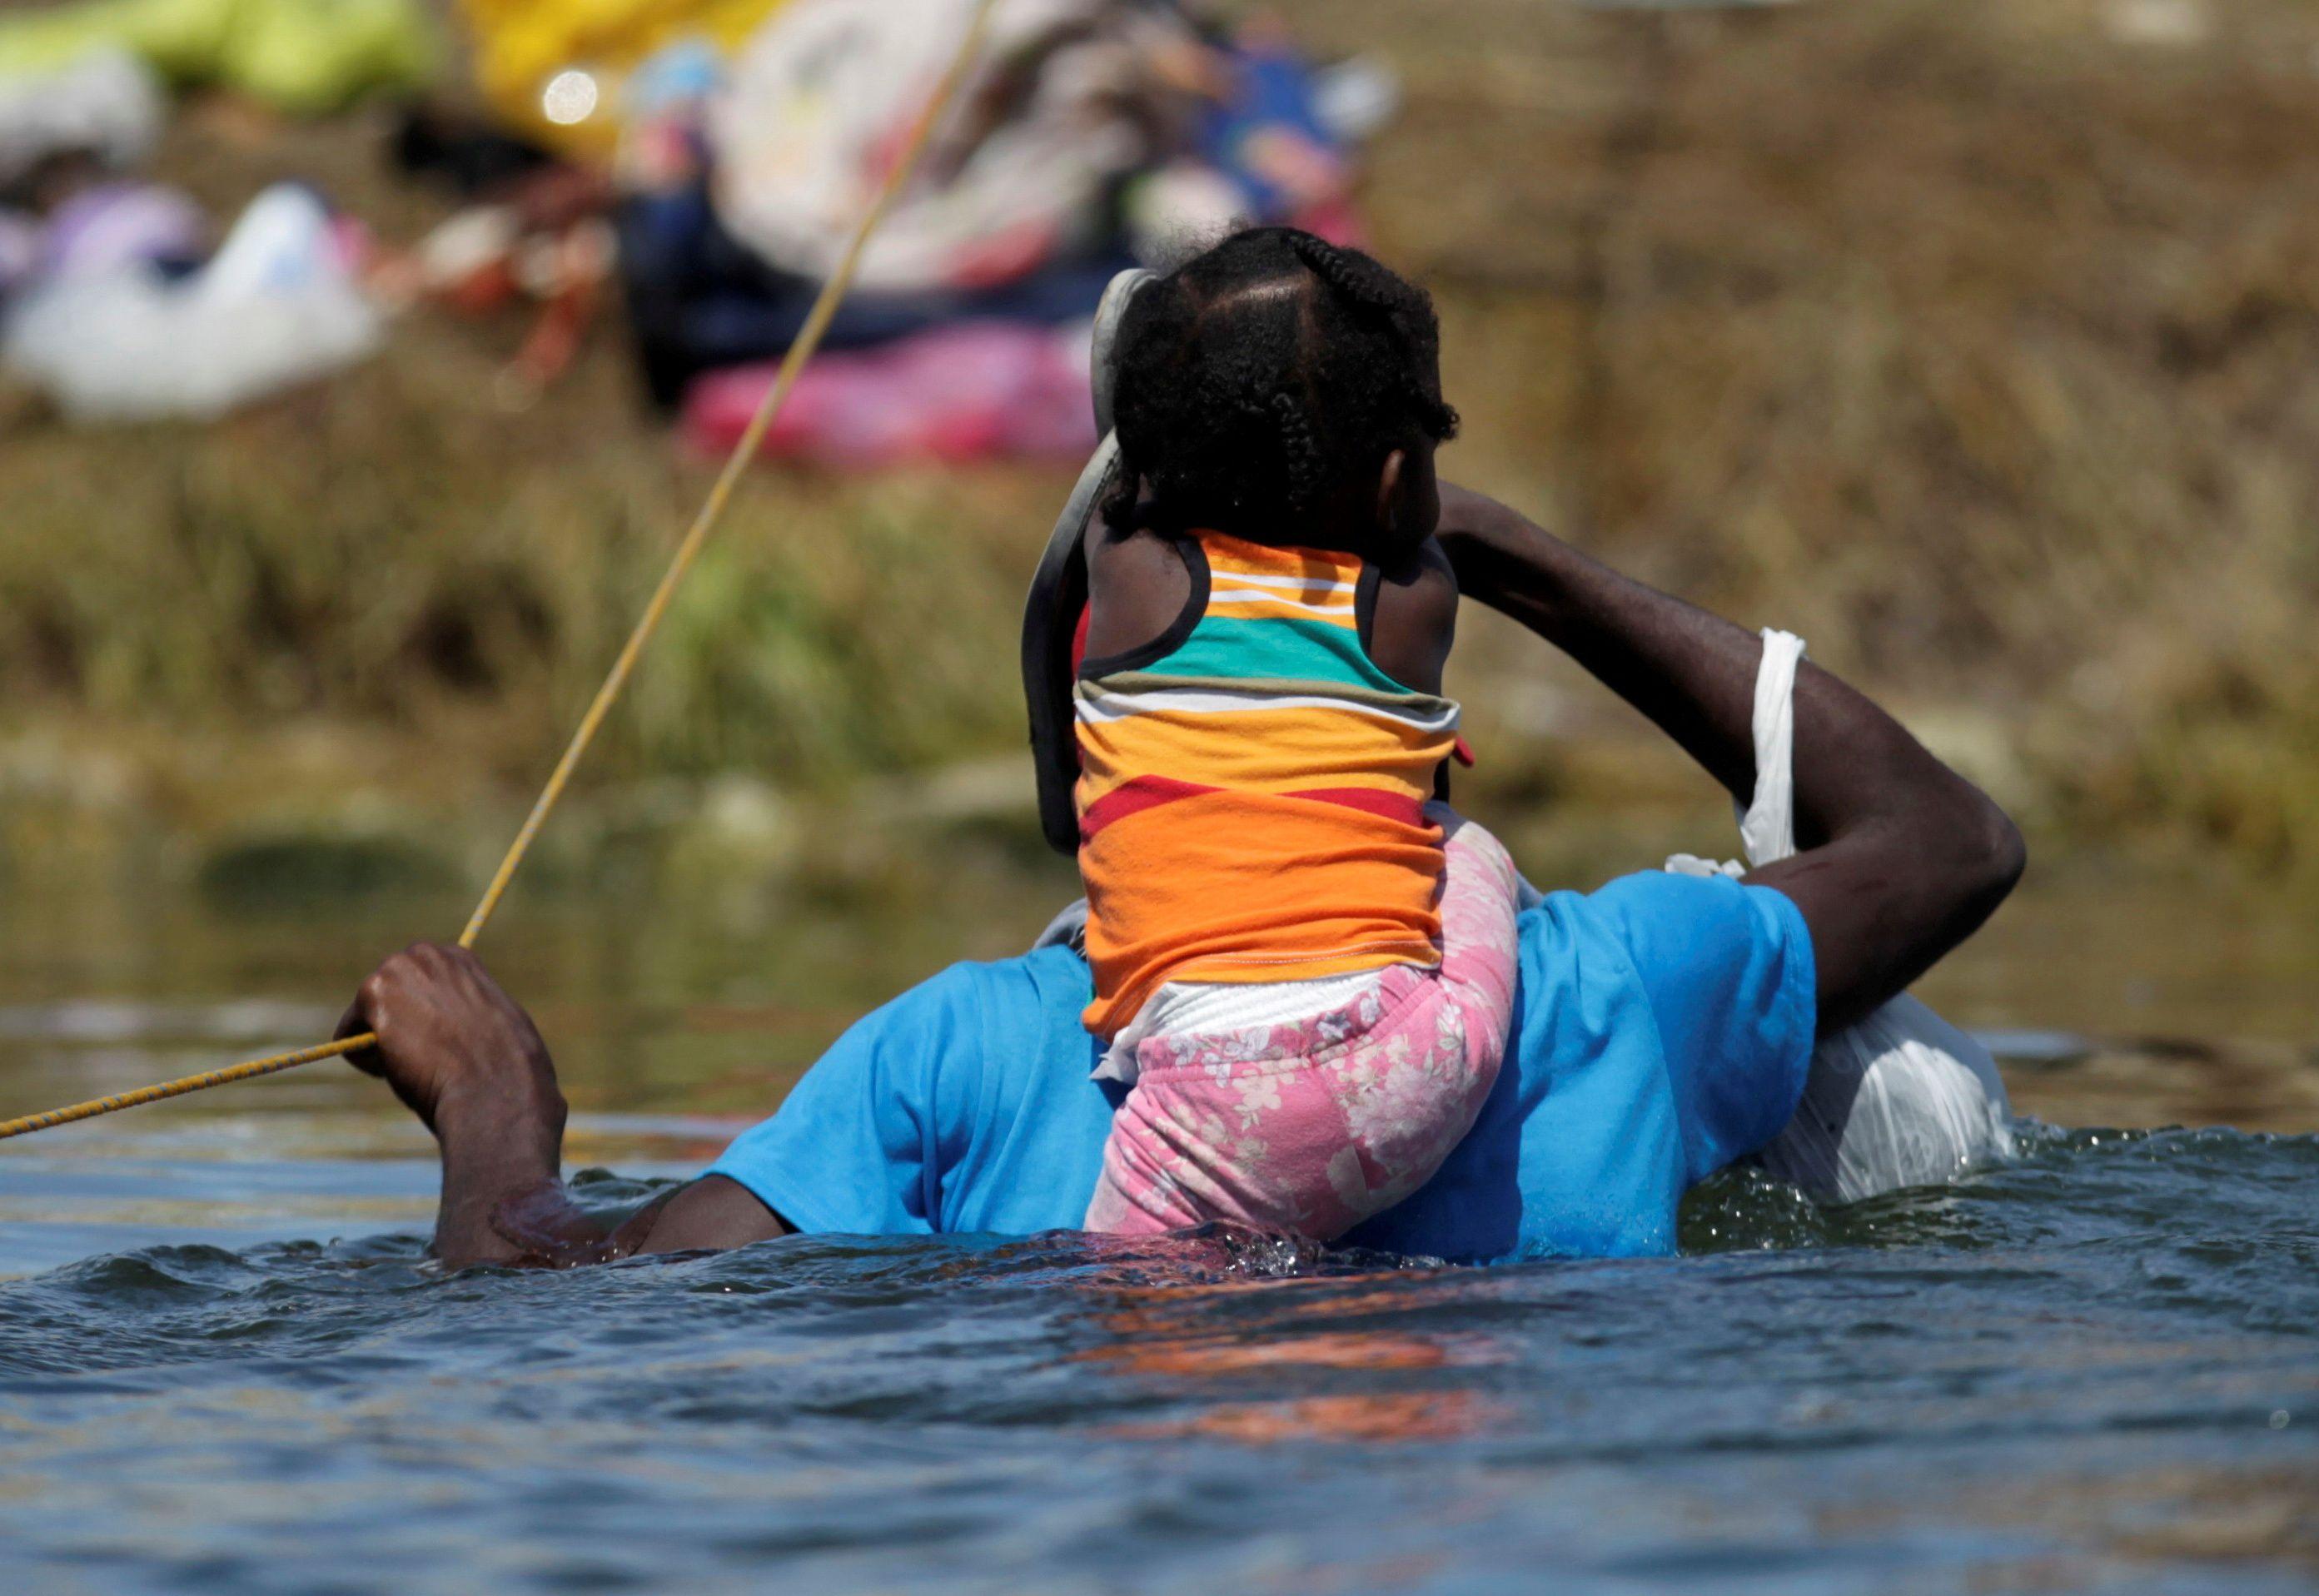 FILE PHOTO: A migrant with a child seeking refuge in the U.S. wades through the Rio Grande from Ciudad Acuna, Mexico toward Del Rio, Texas, U.S., in Ciudad Acuna, Mexico September 22, 2021. REUTERS/Daniel Becerril/File Photo